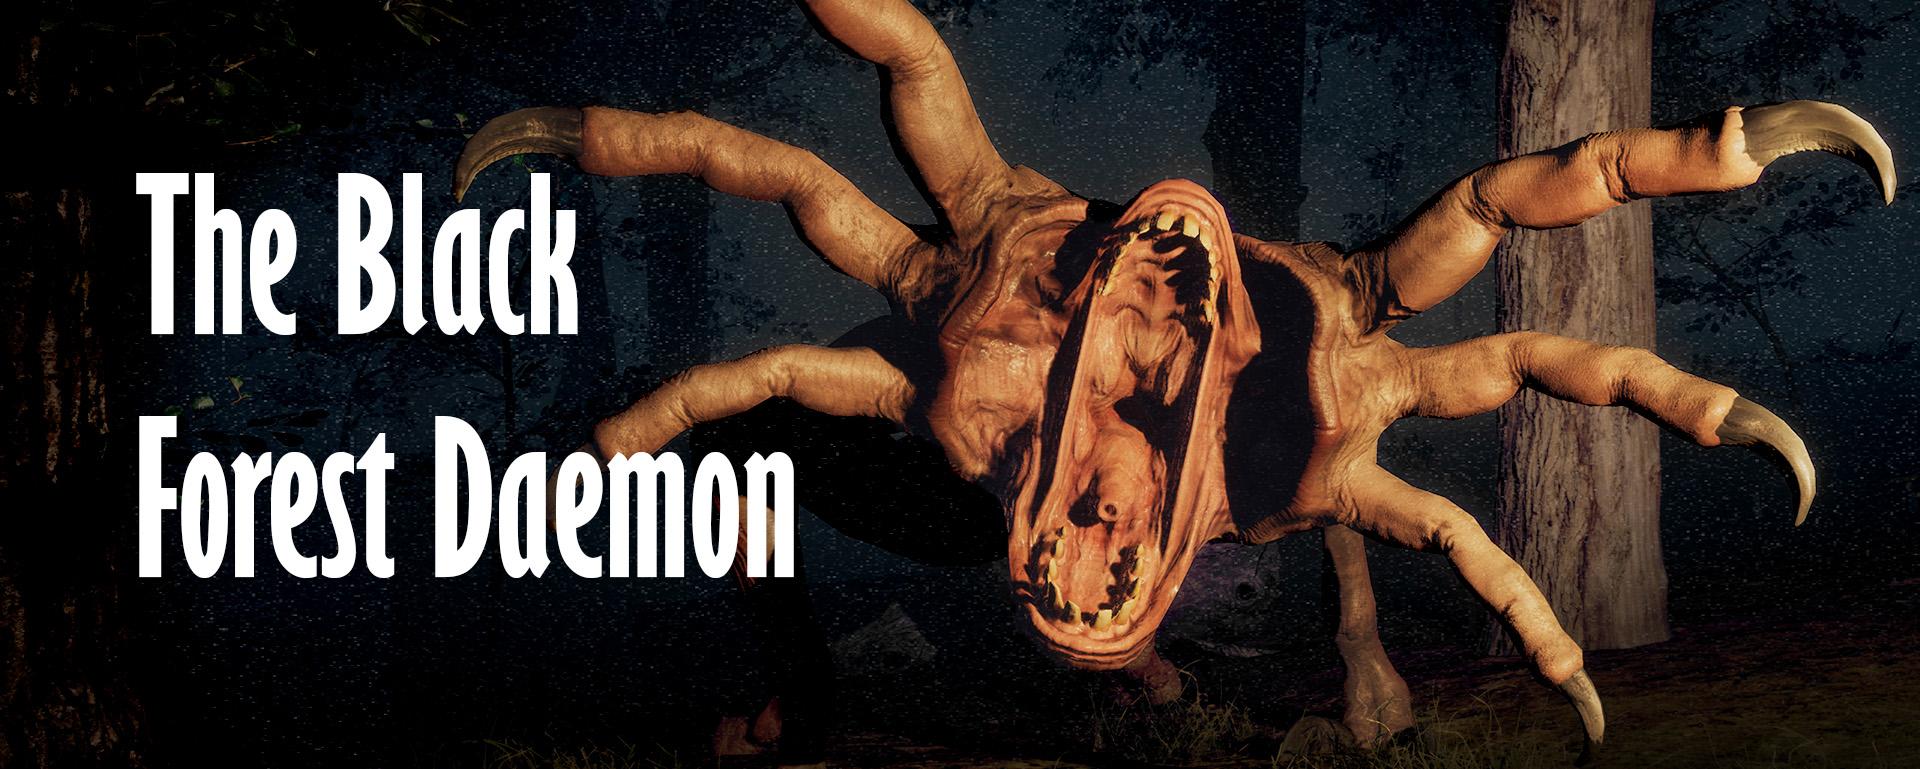 The Black Forest Daemon